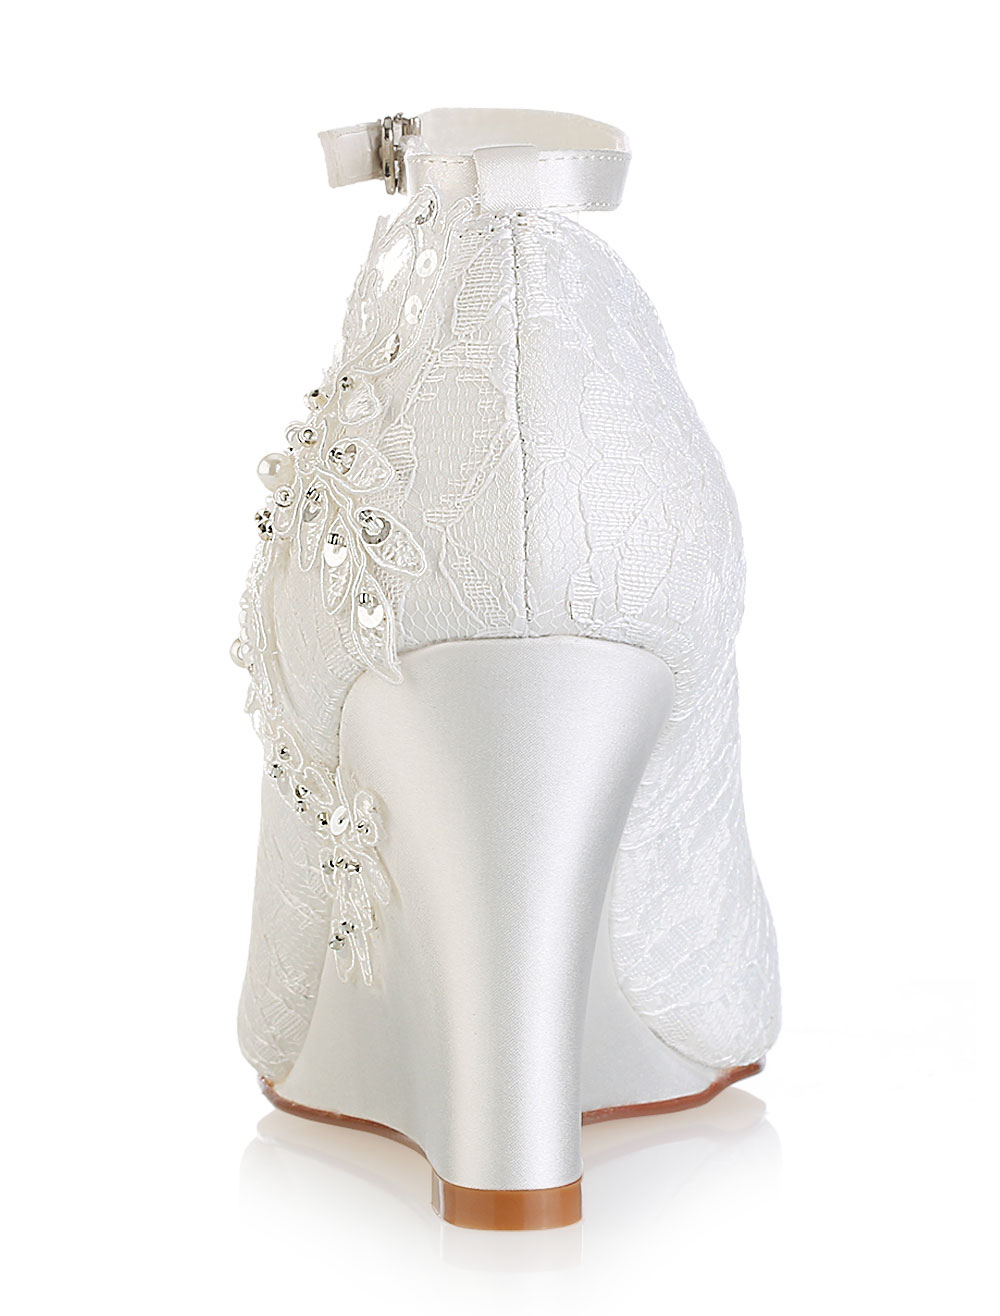 8d9841ea9 ... Lace Wedding Shoes Ivory Peep Toe Flowers Detail Wedge Shoes Ankle  Strap Bridal Shoes-No ...